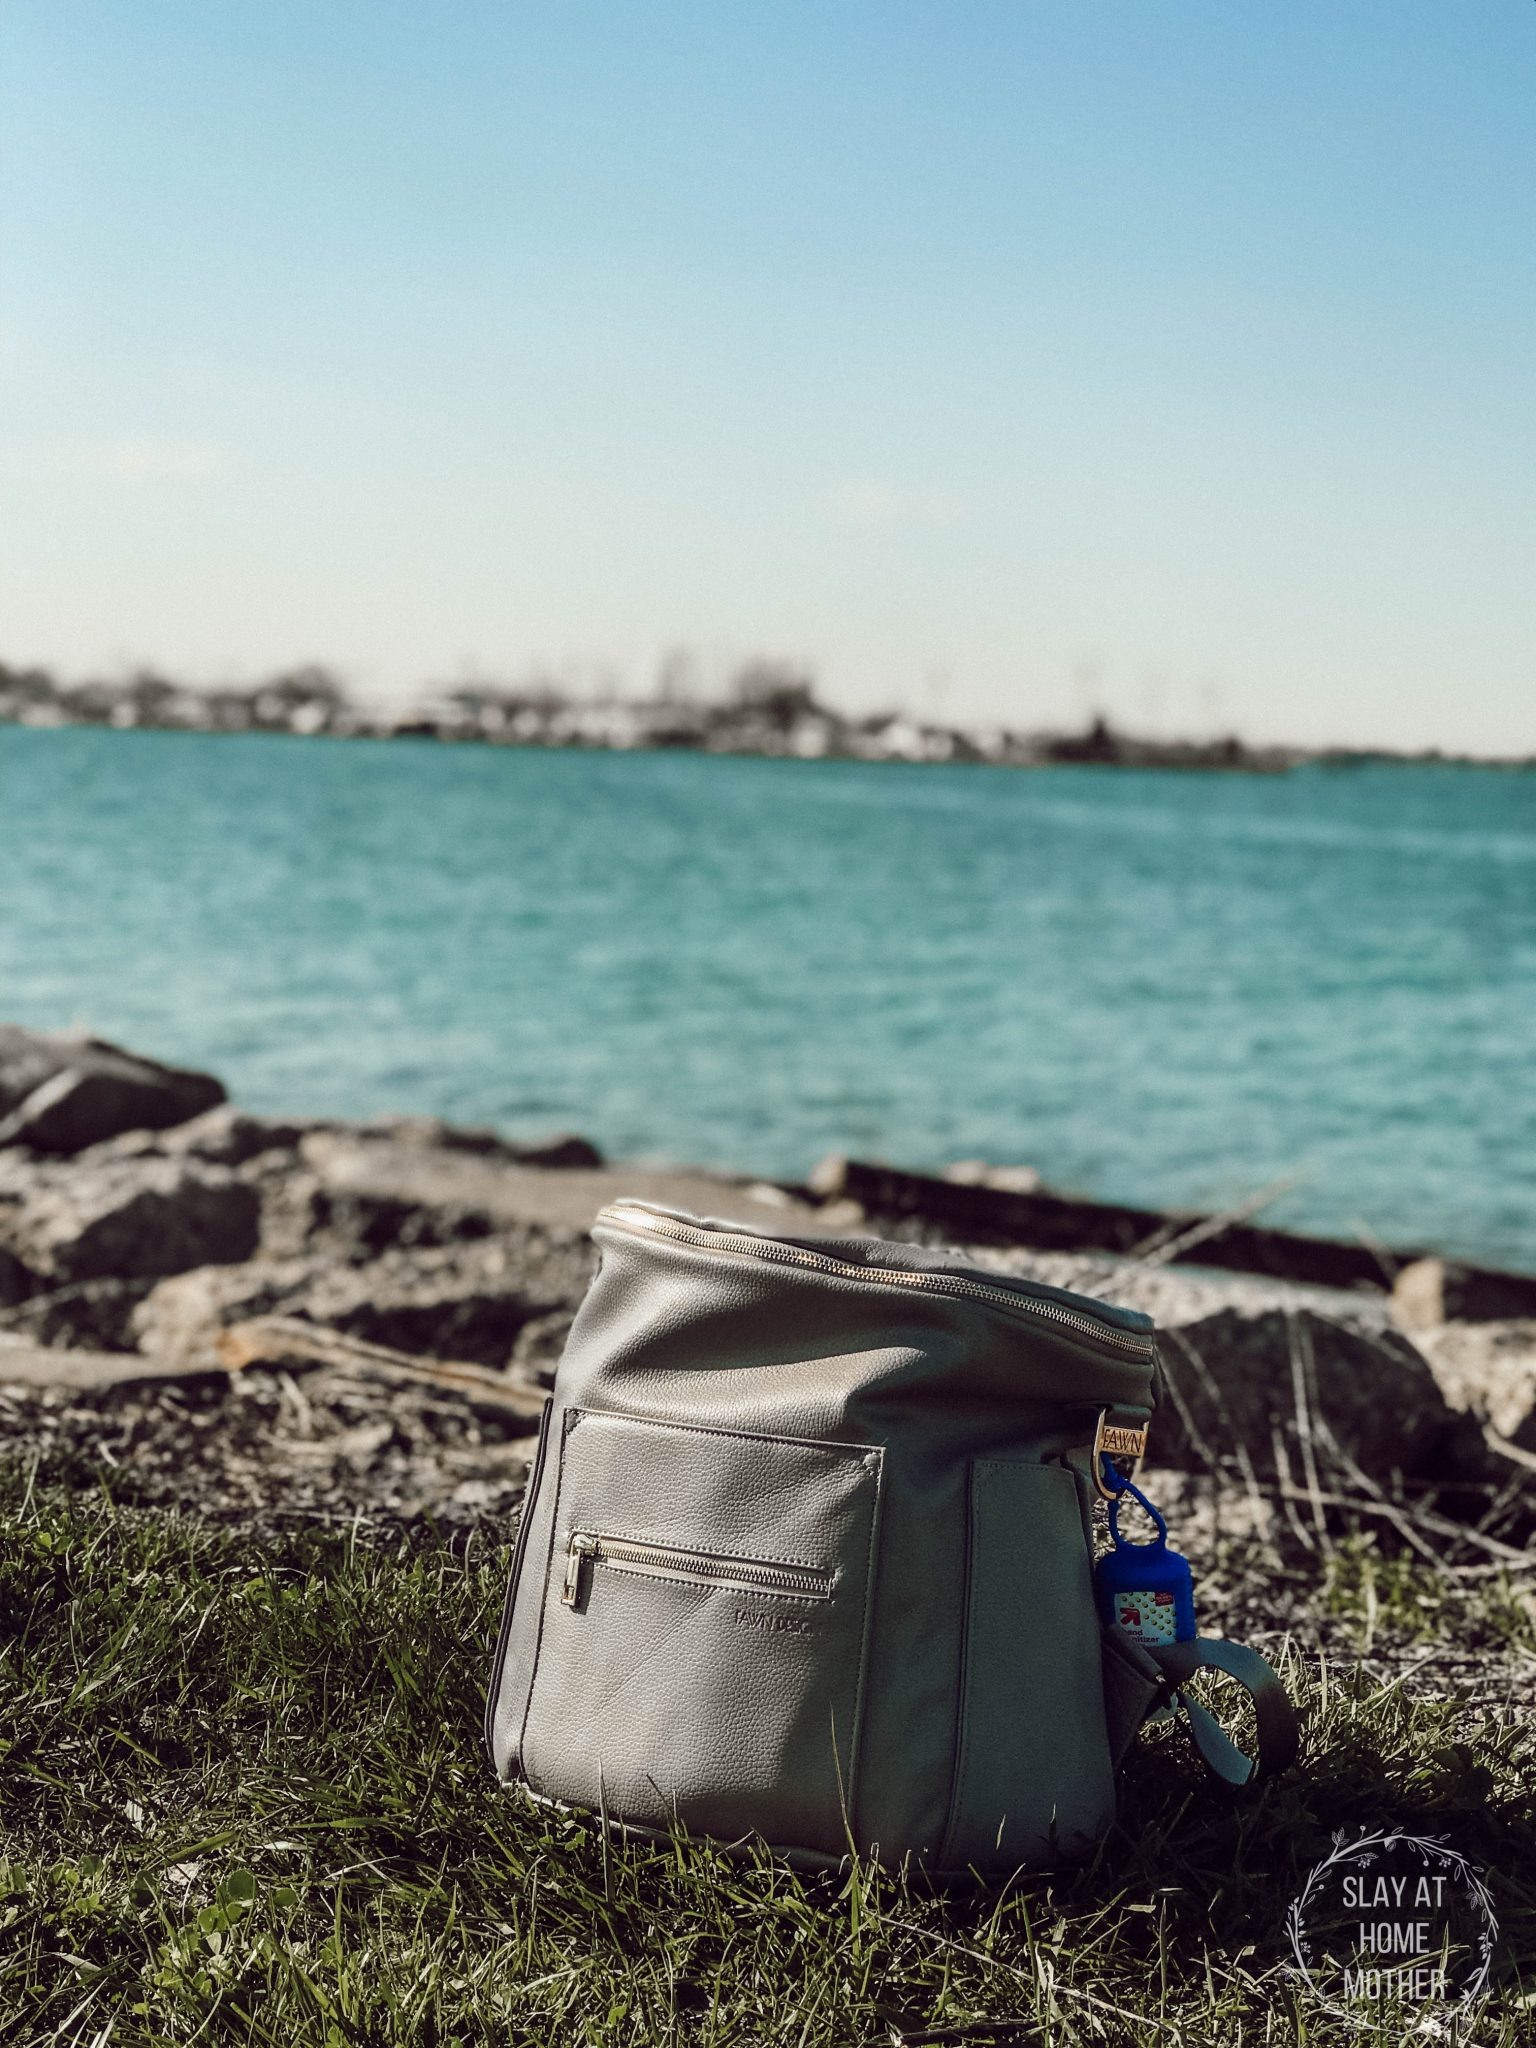 Fawn Design Diaper Bag - SlayAtHomeMother.com